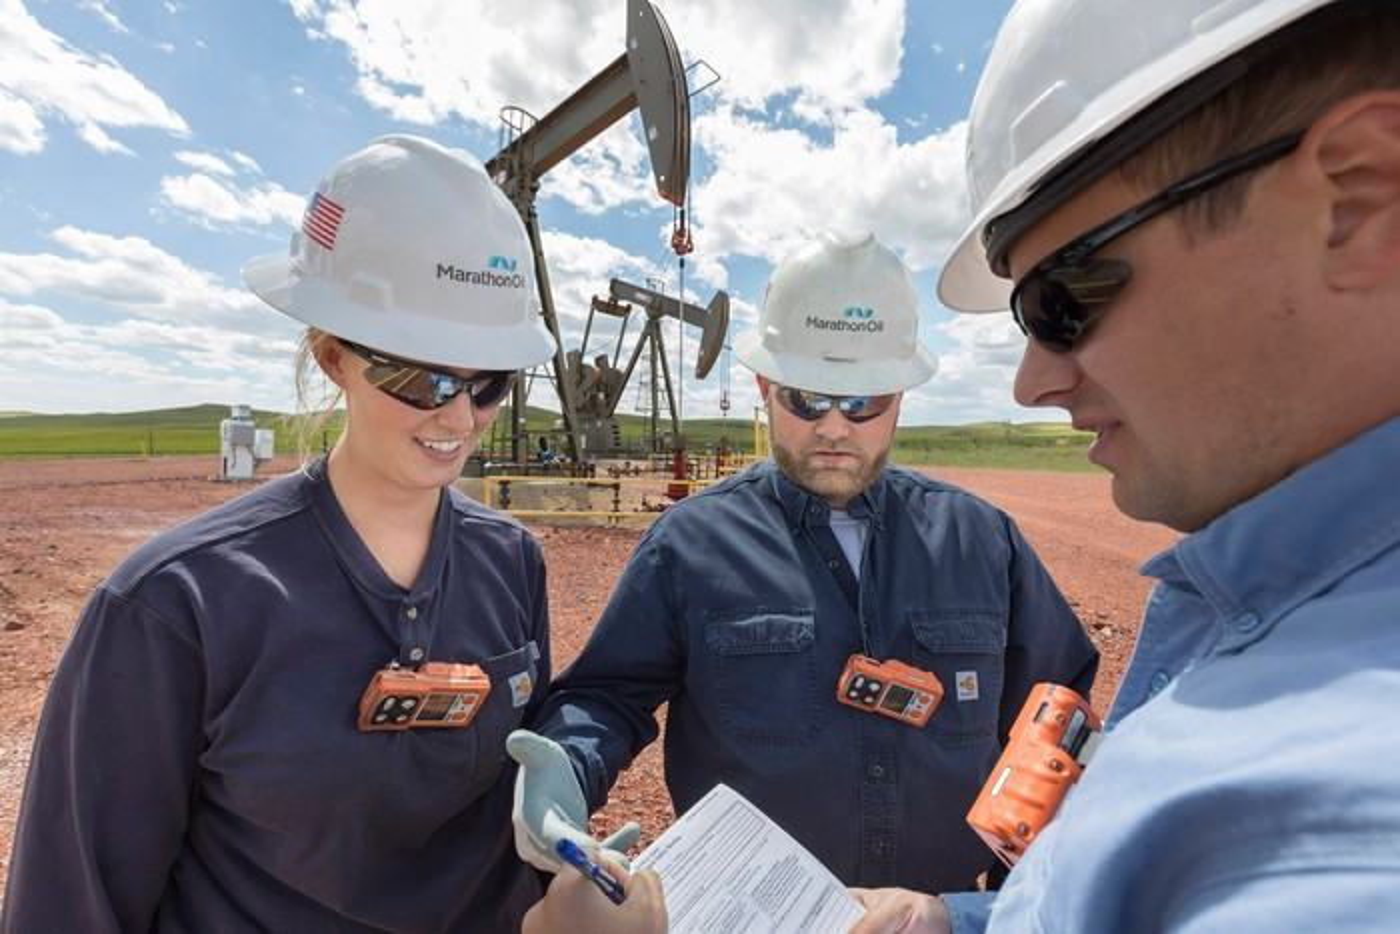 Three workers wearing Marathon hardhats in front of oil wells.